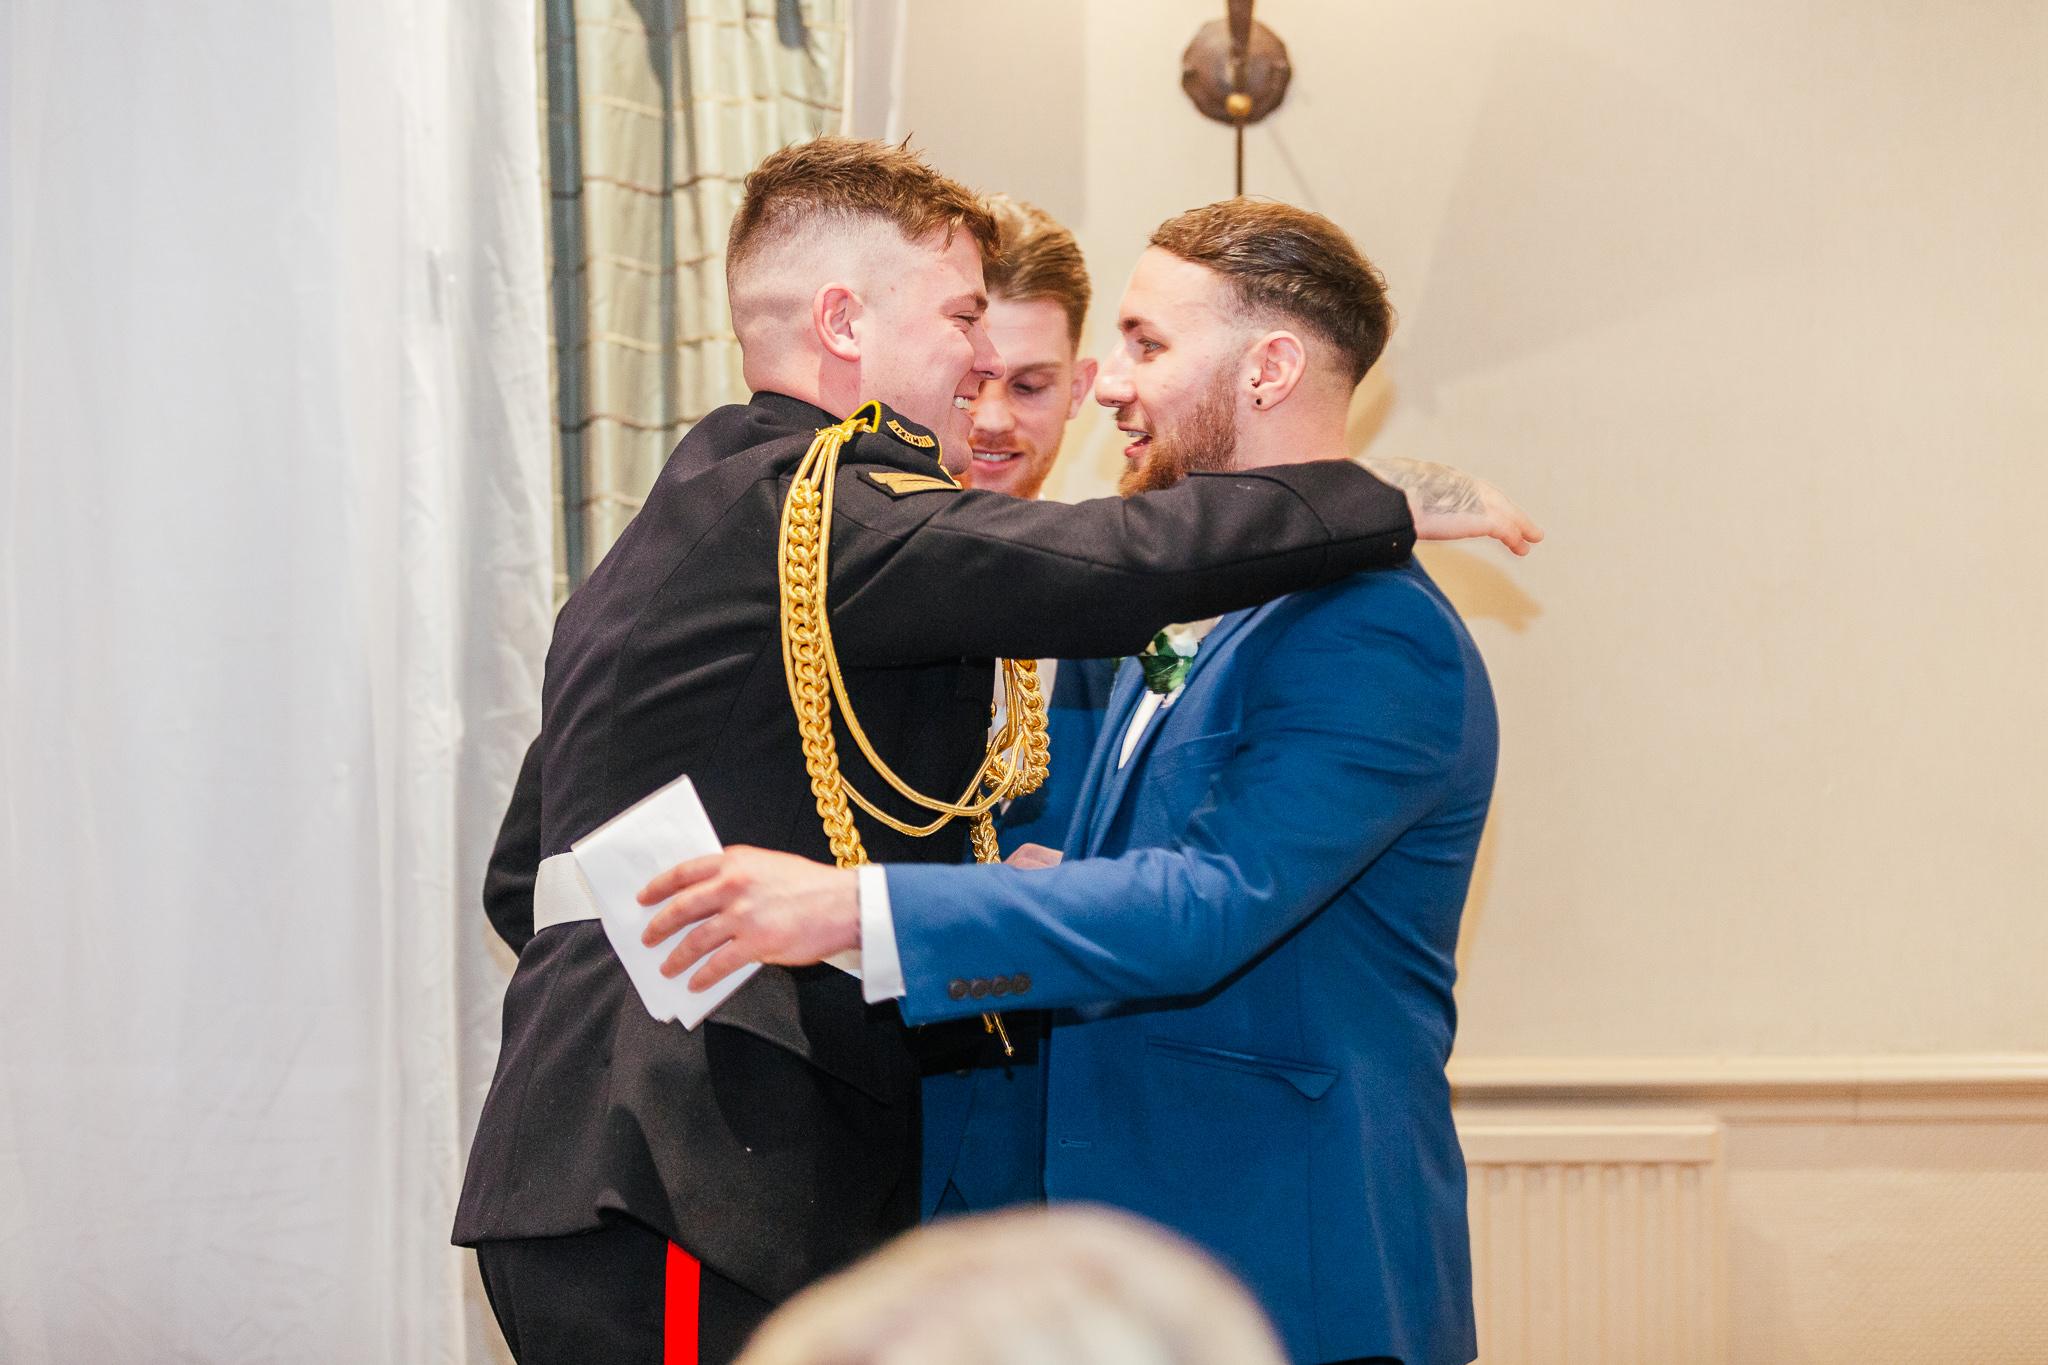 Mollingtonbanastre_wedding-18.jpg